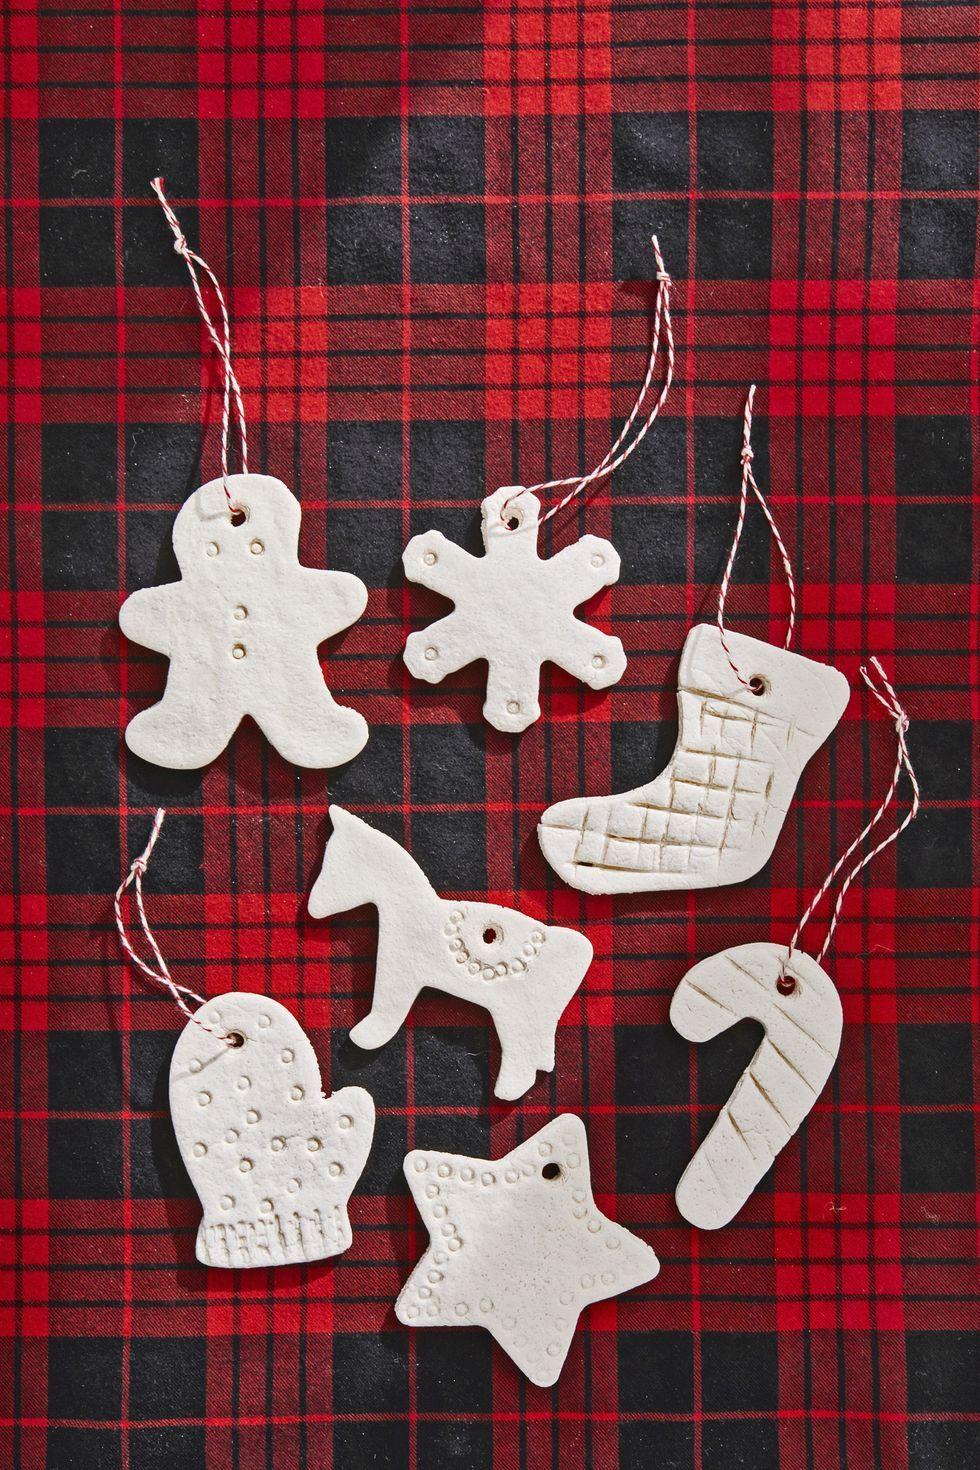 28 Diy Salt Dough Ornament Ideas How To Make Salt Dough Christmas Ornaments